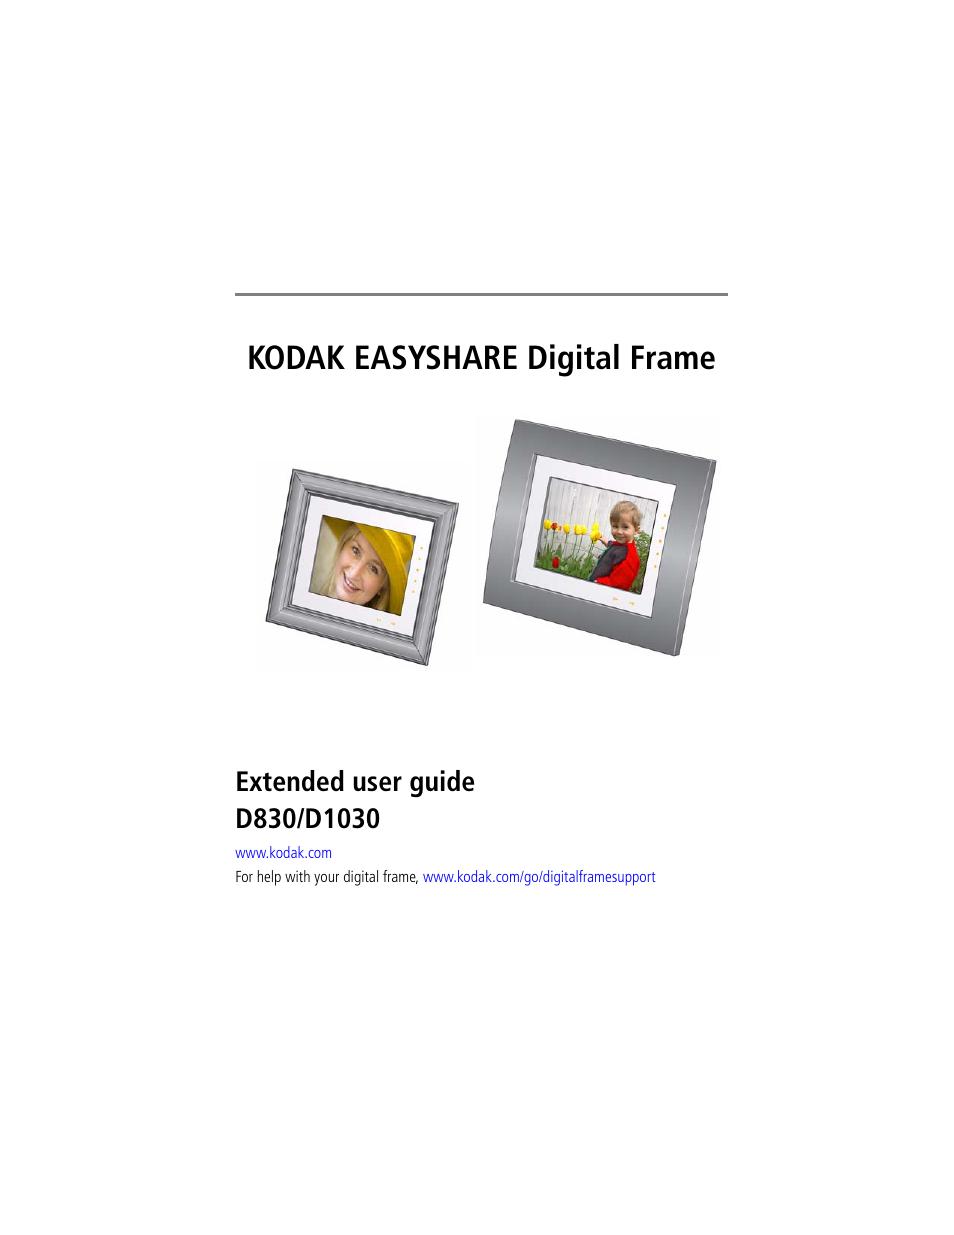 kodak d830 user manual 56 pages also for easyshare d1030 rh manualsdir com kodak easyshare sv710 digital picture frame manual Kodak EasyShare Picture Frame